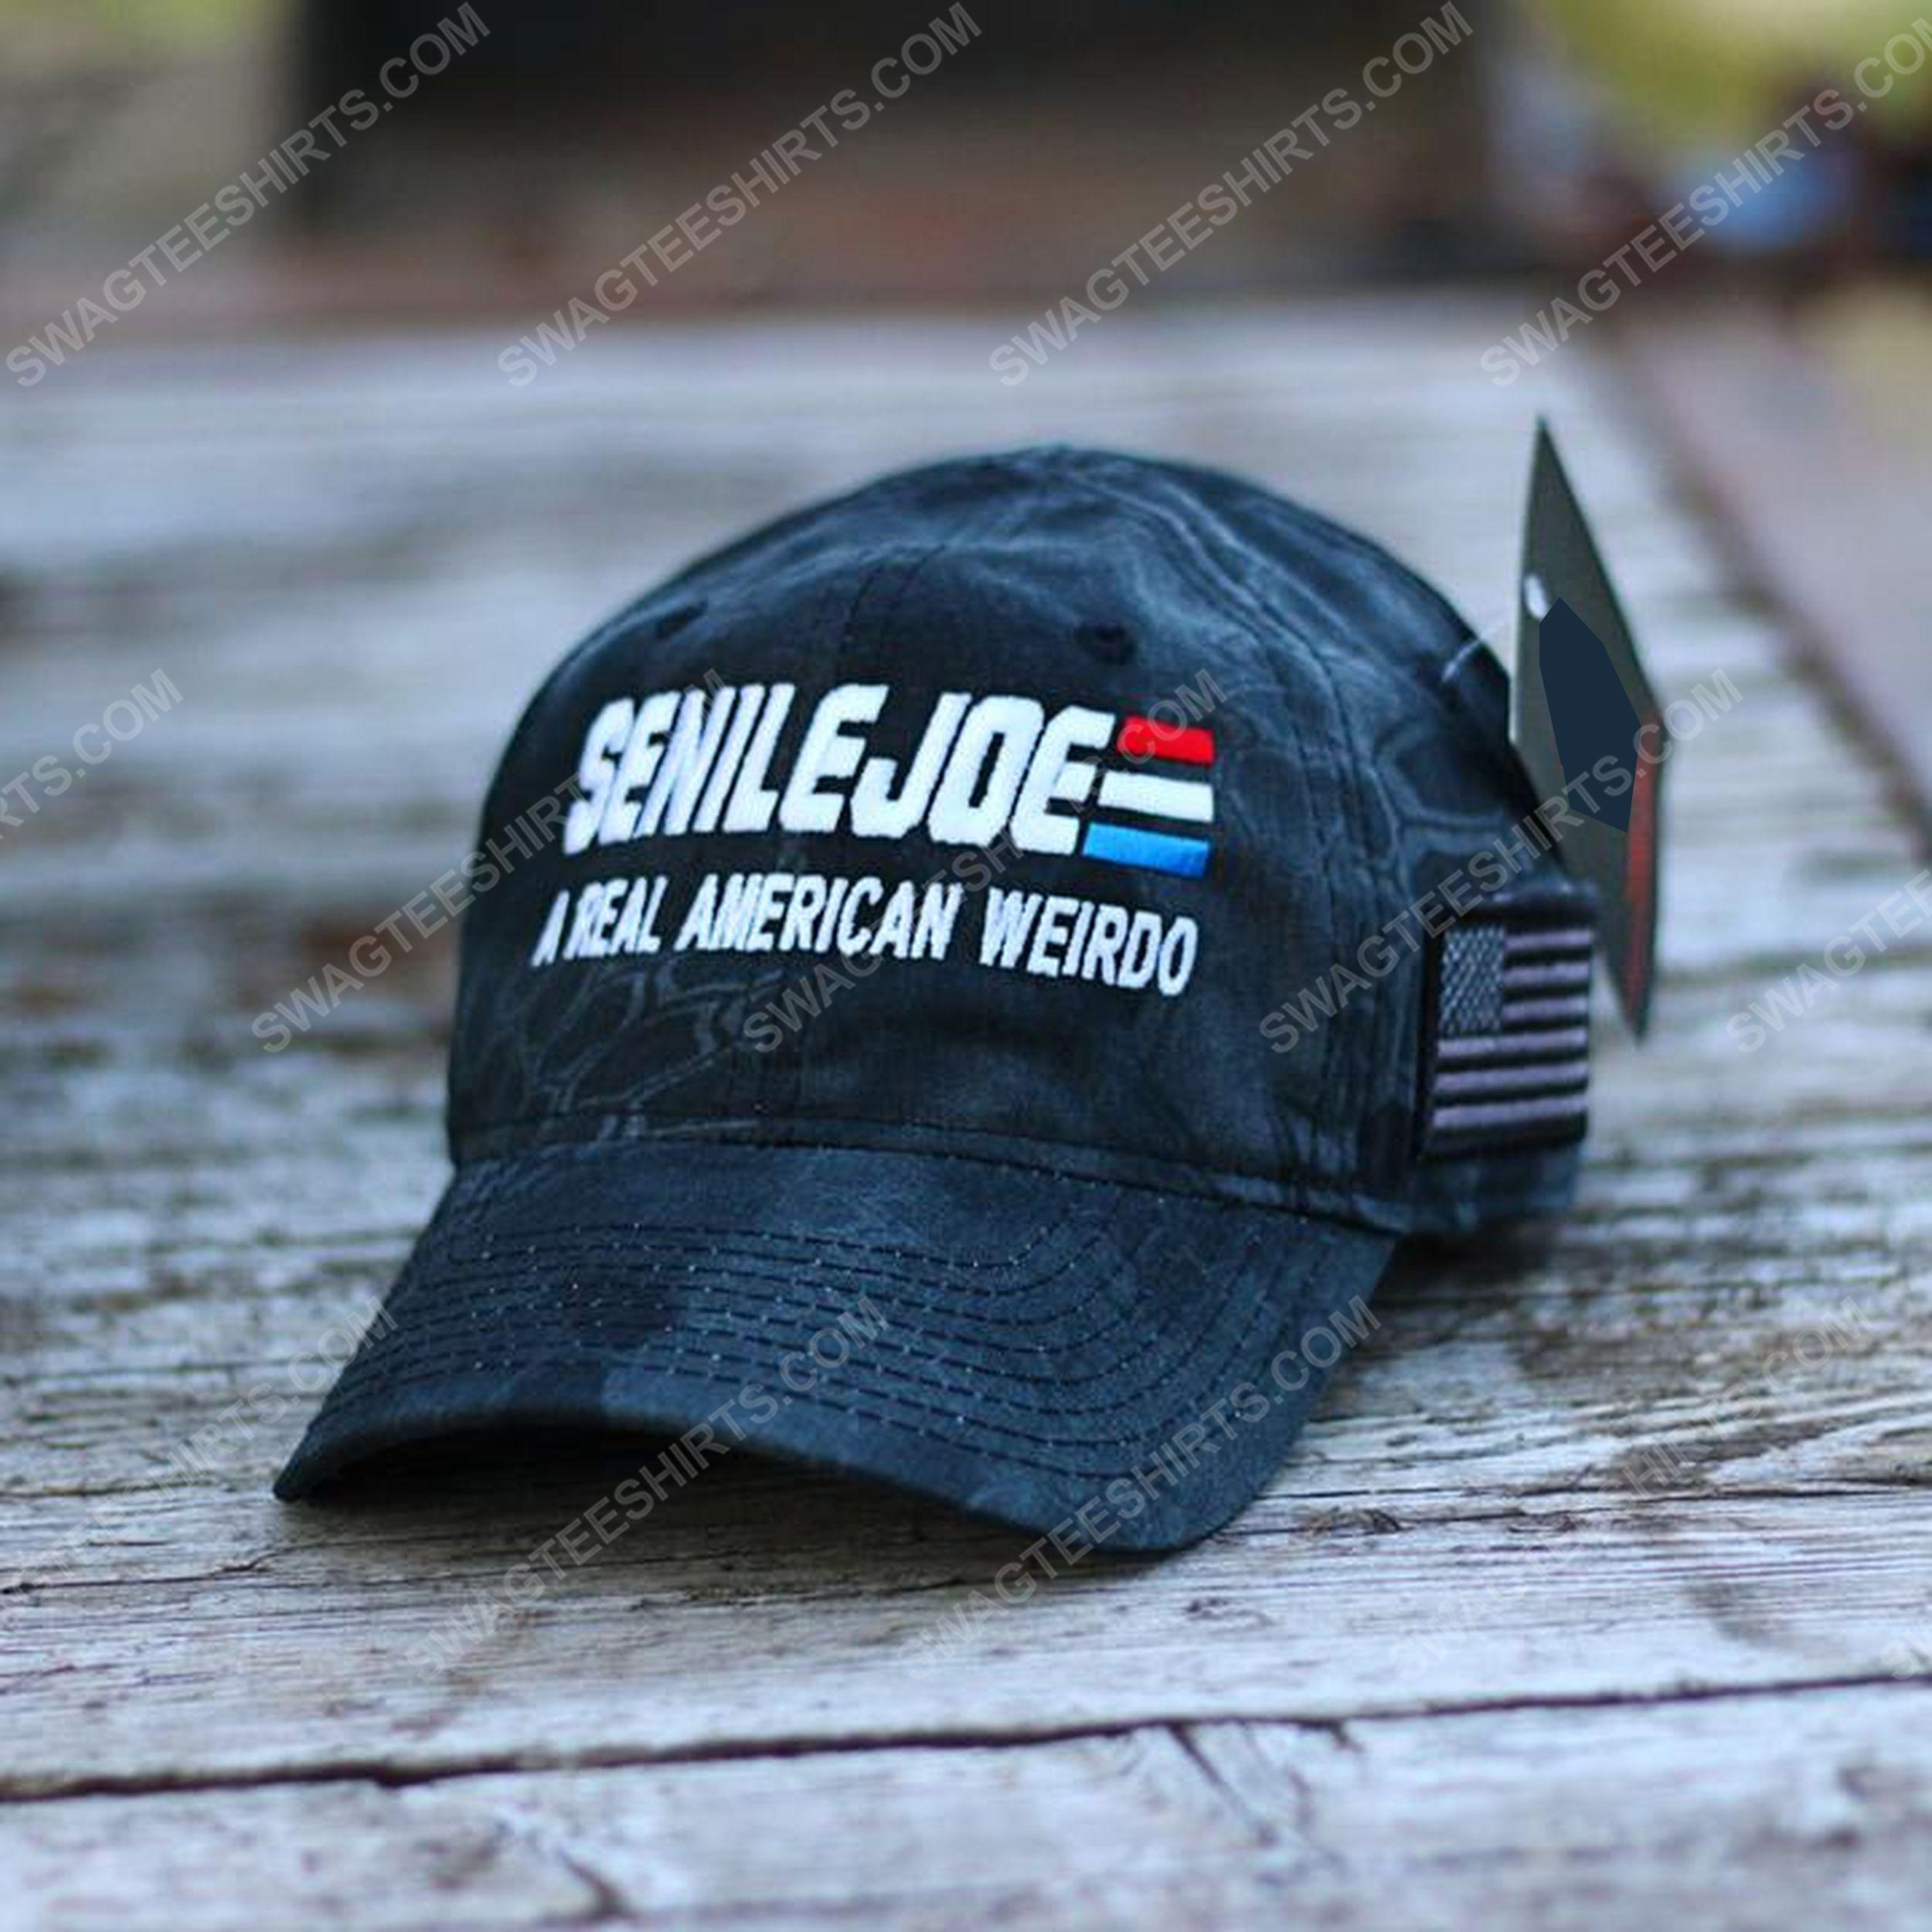 Senile joe a real american weirdo full print classic hat 1